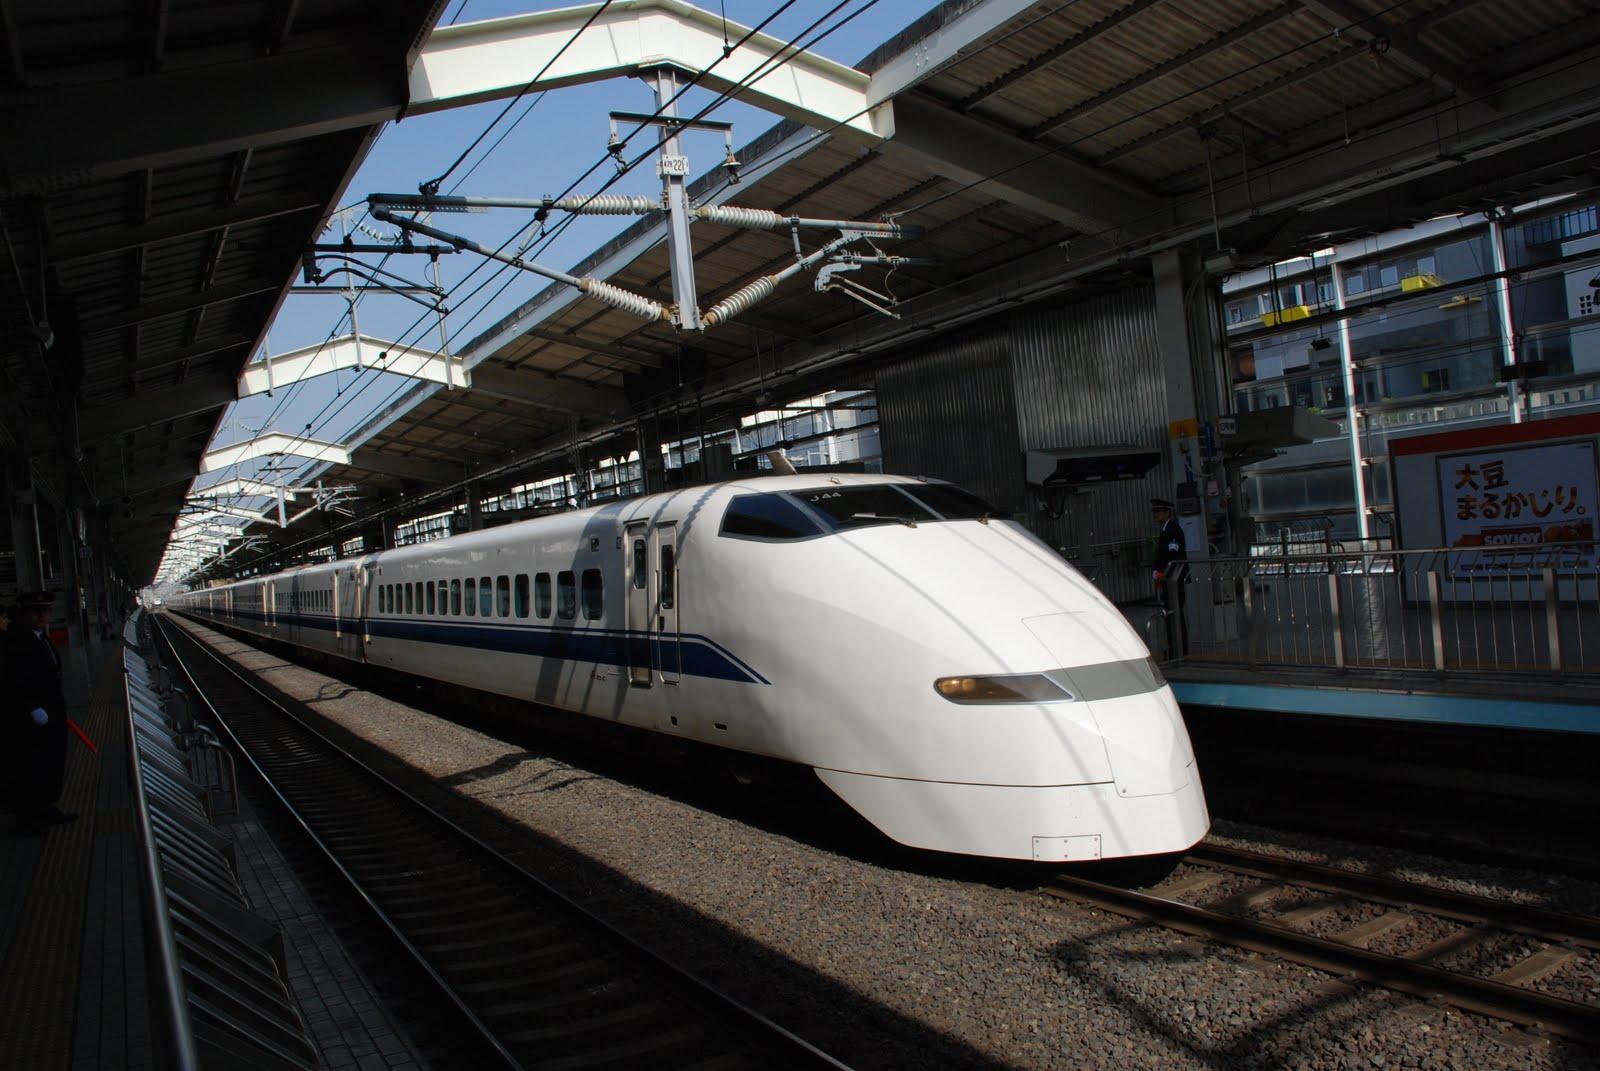 http://3.bp.blogspot.com/-R4sVm-LXRFQ/Tb2DdVdLvfI/AAAAAAAACME/tj3dpPX0r4k/s1600/white-bullet-train.jpg